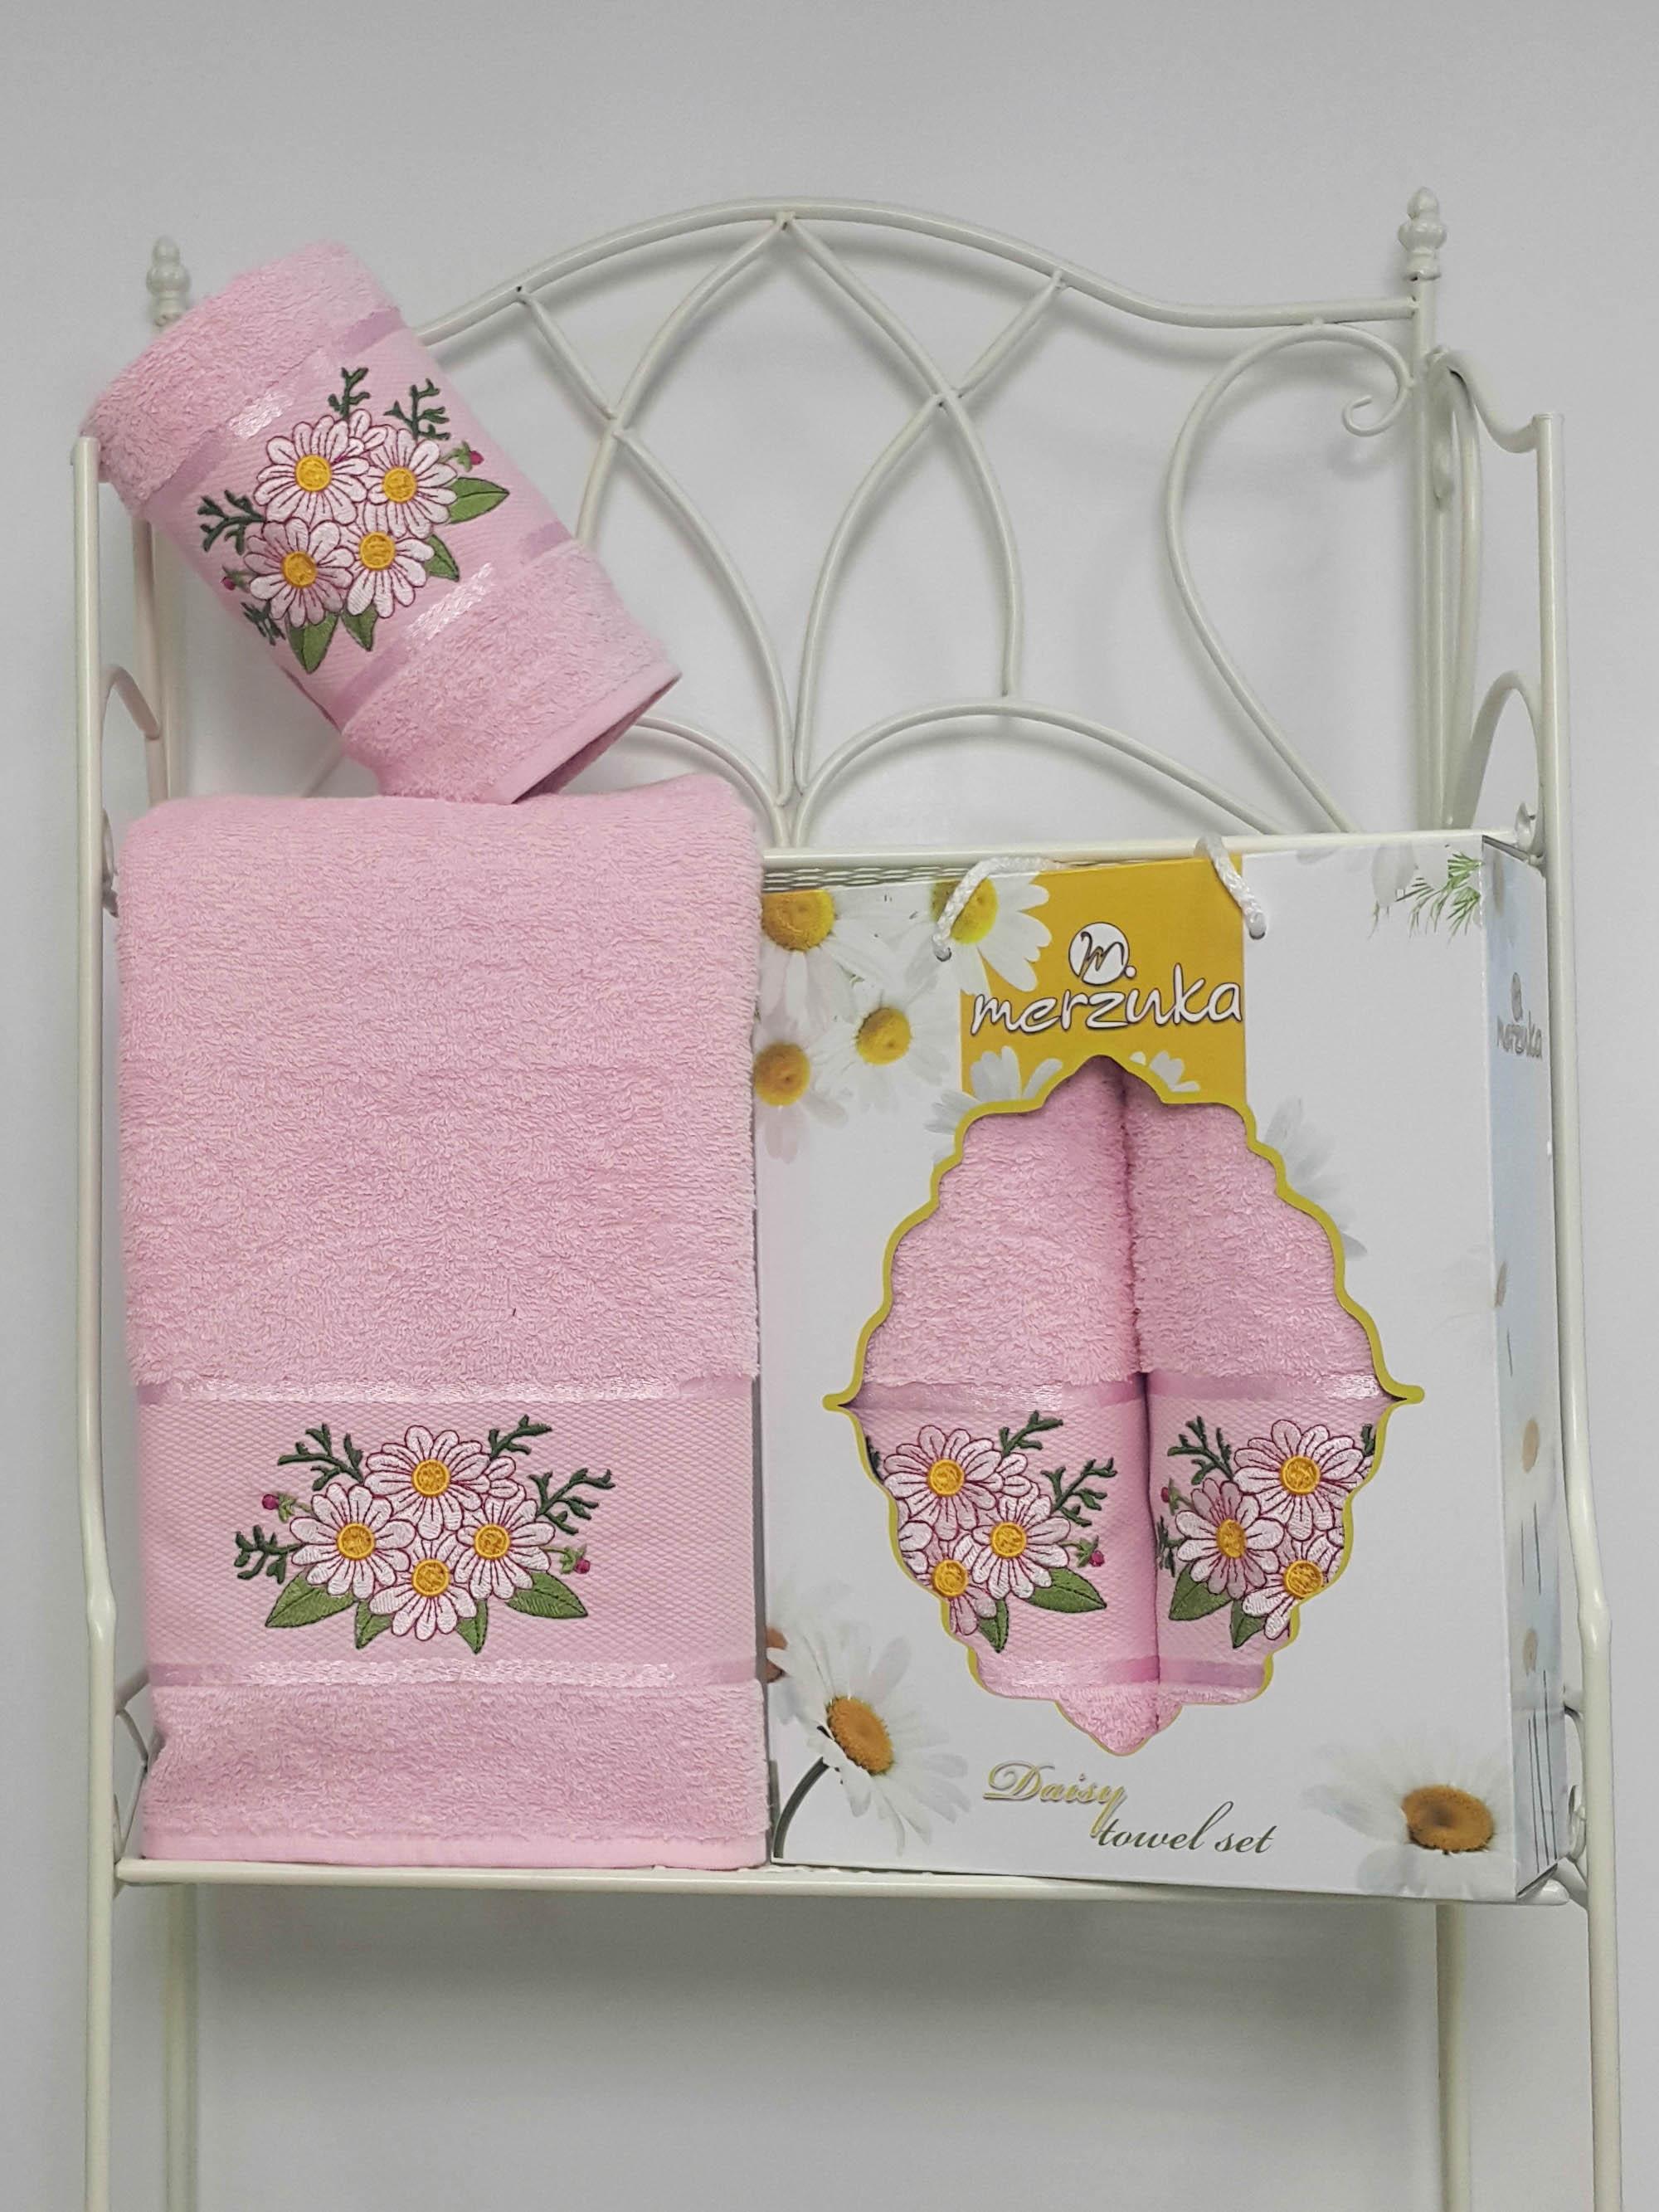 Полотенца Oran Merzuka Набор из 2 полотенец Daisy Цвет: Светло-Розовый набор из 3 полотенец merzuka sakura 50х90 2 70х140 8432 оранжевый